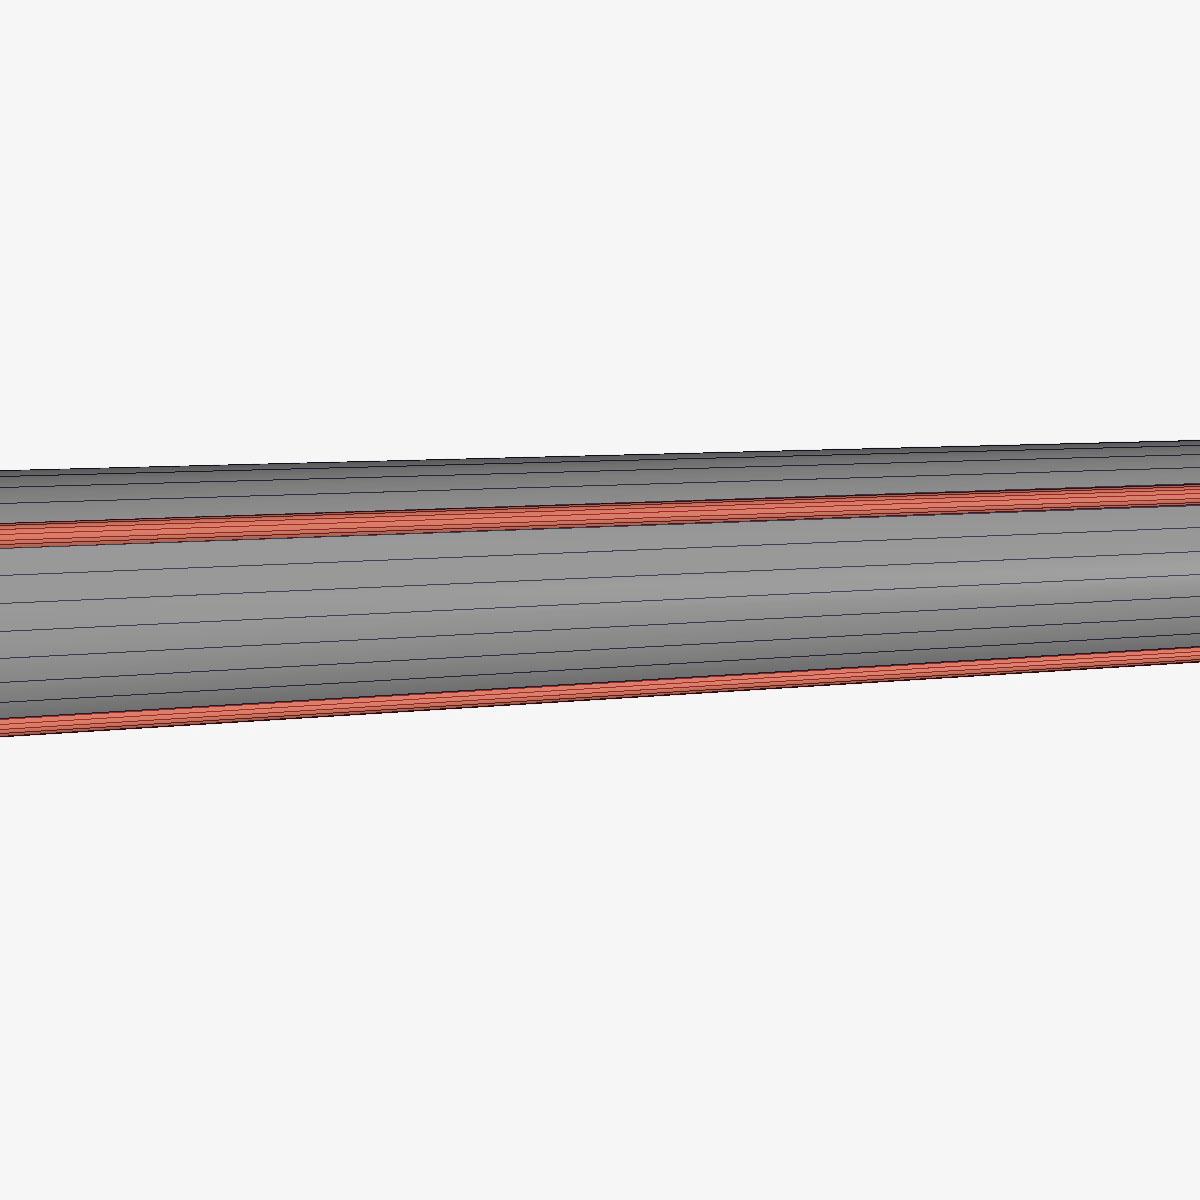 aerobee 170 rocket 3d model 3ds dxf fbx blend cob dae x  obj 166045